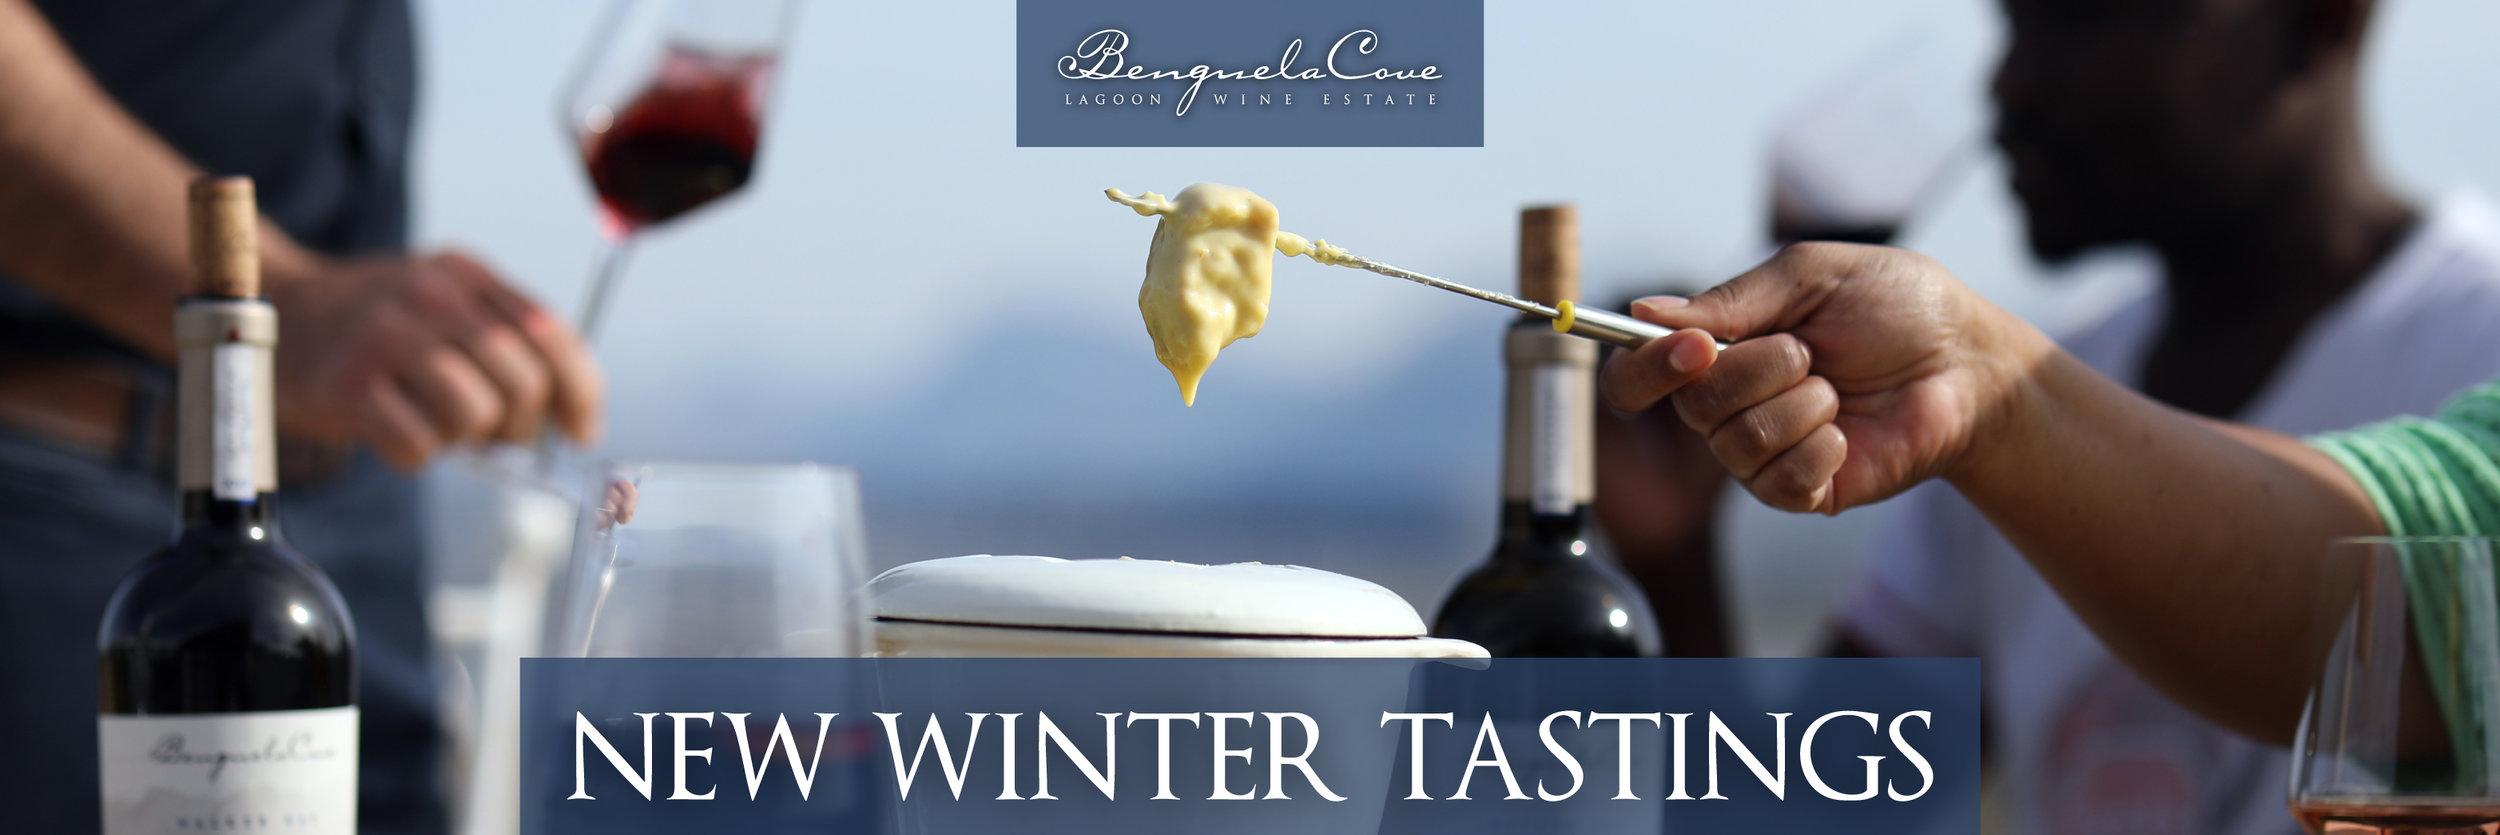 New winter tastings fondue.jpg